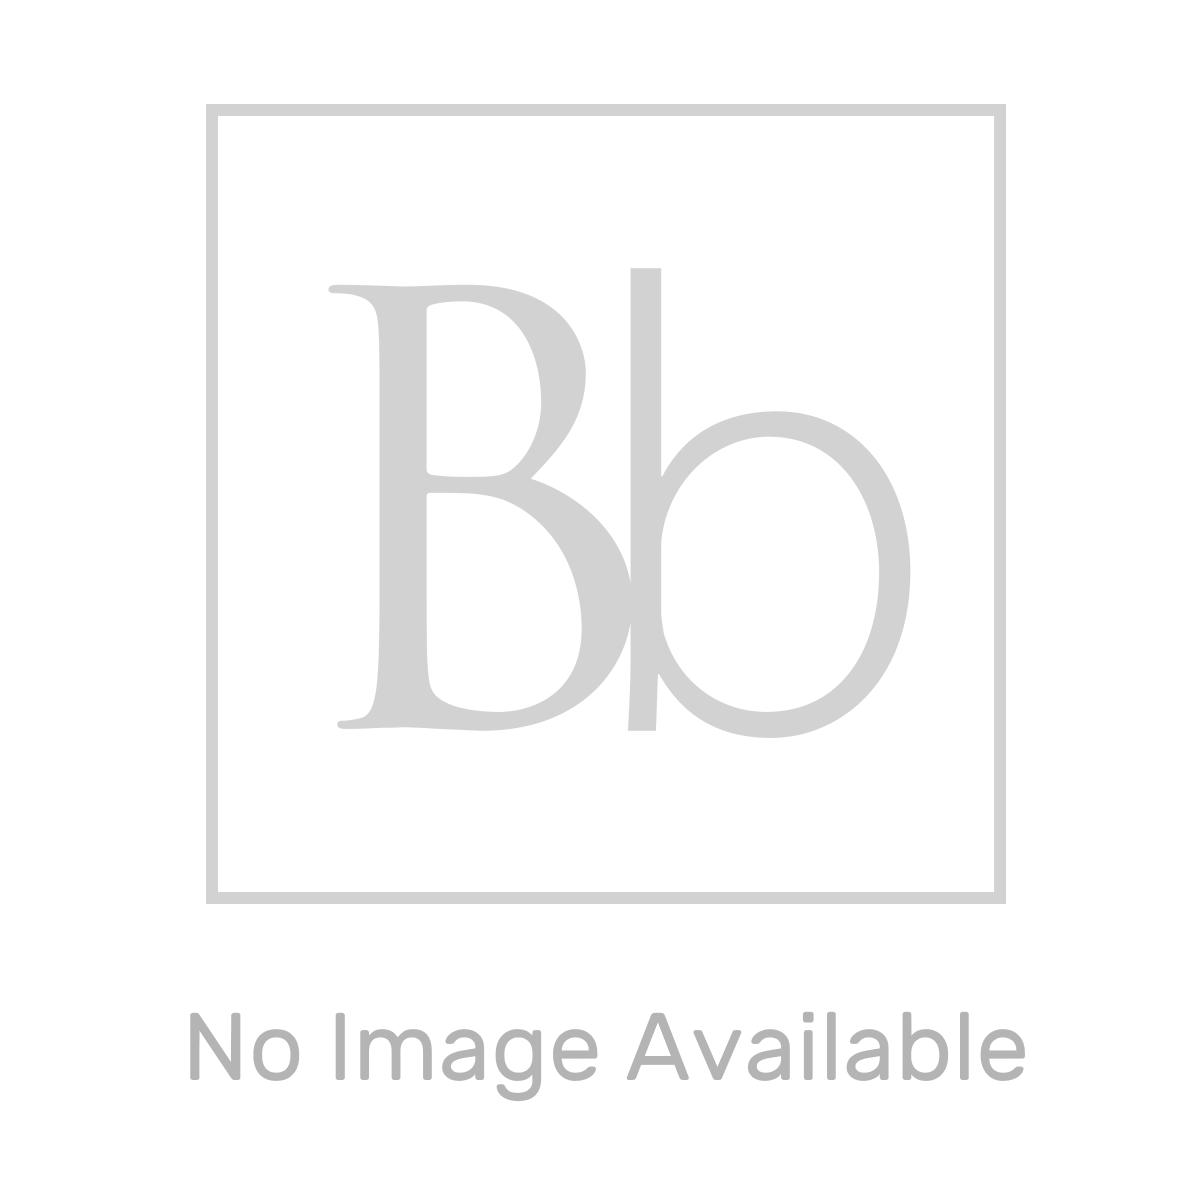 Kartell Purity Grey Ash 2 Piece Bath End Panel 800mm